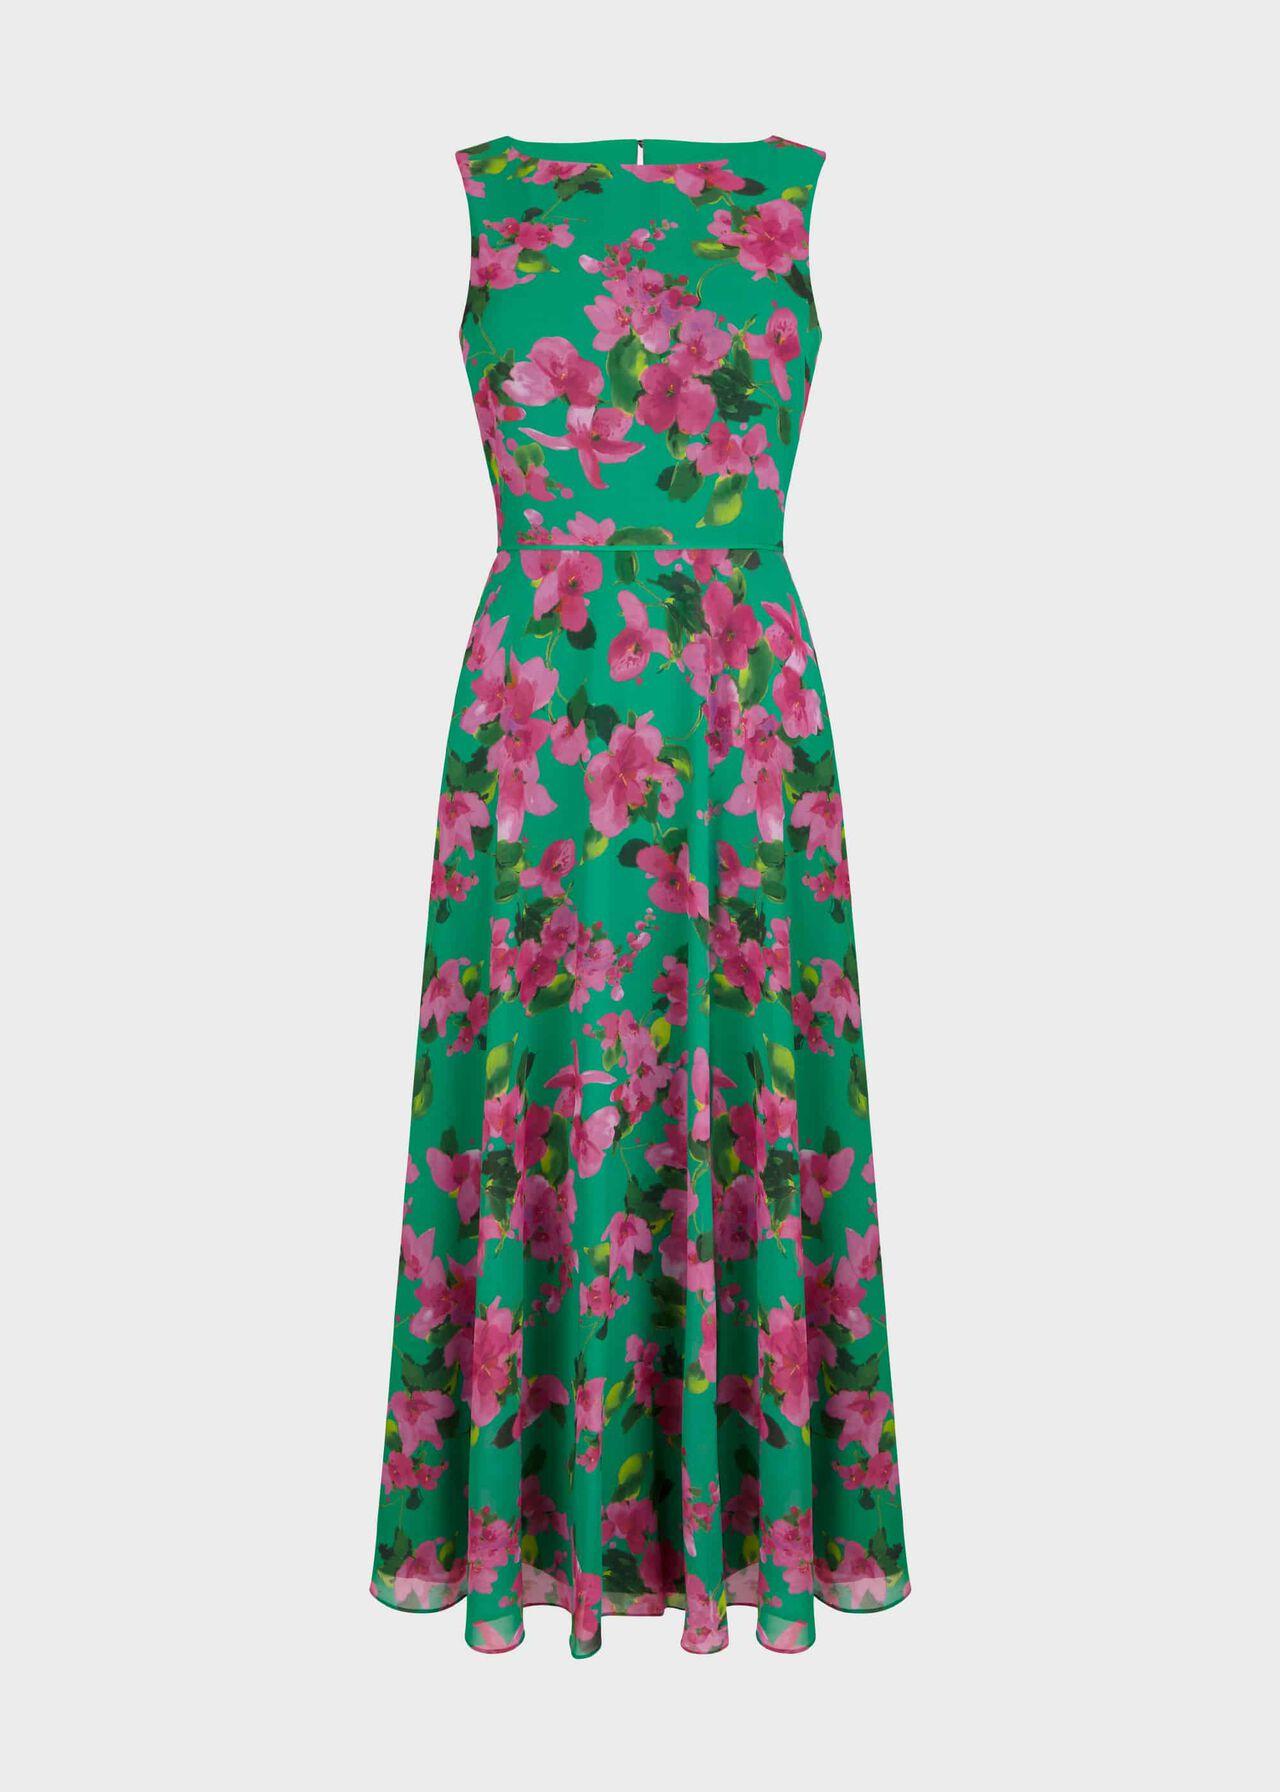 Petite Carly Dress Fld Grn Fschia